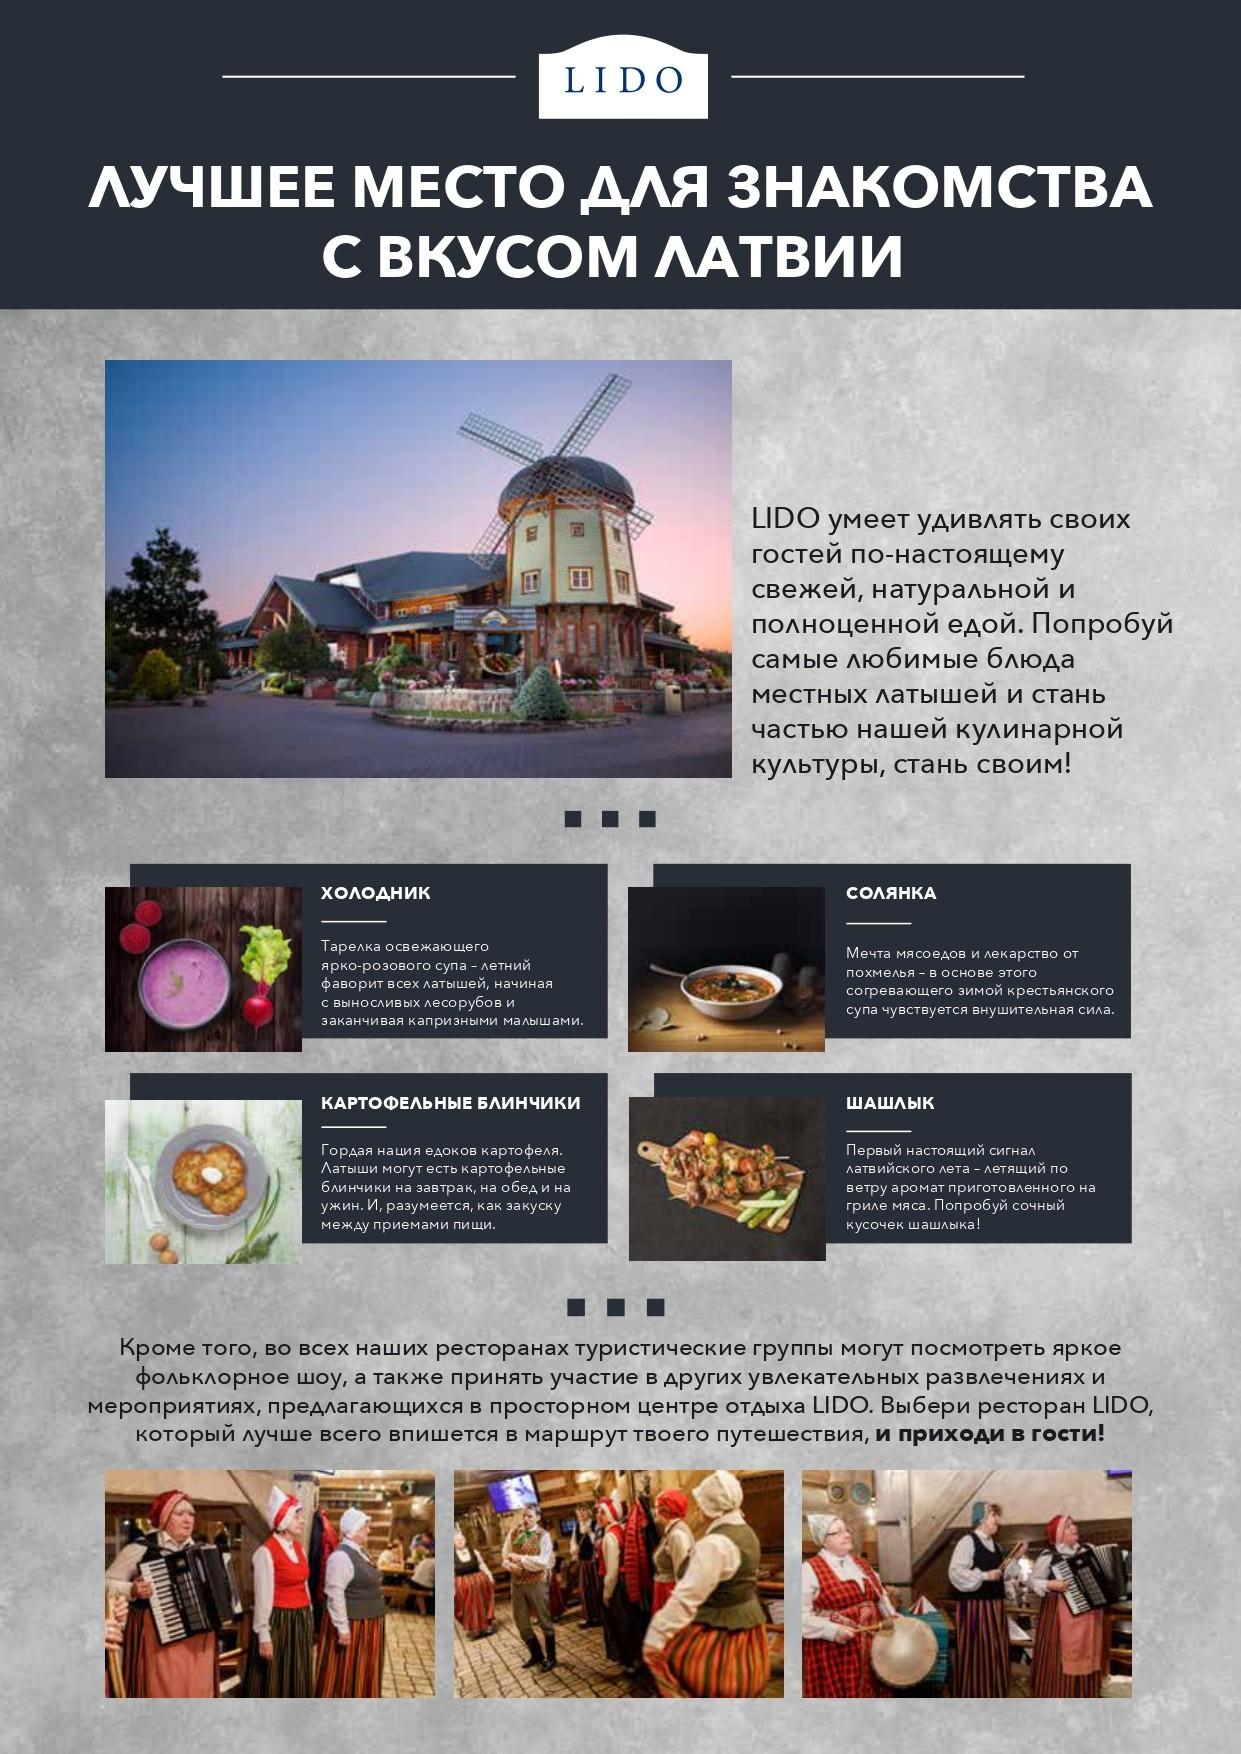 LIDO_turistu_grupam__RUS_page-0001.jpg